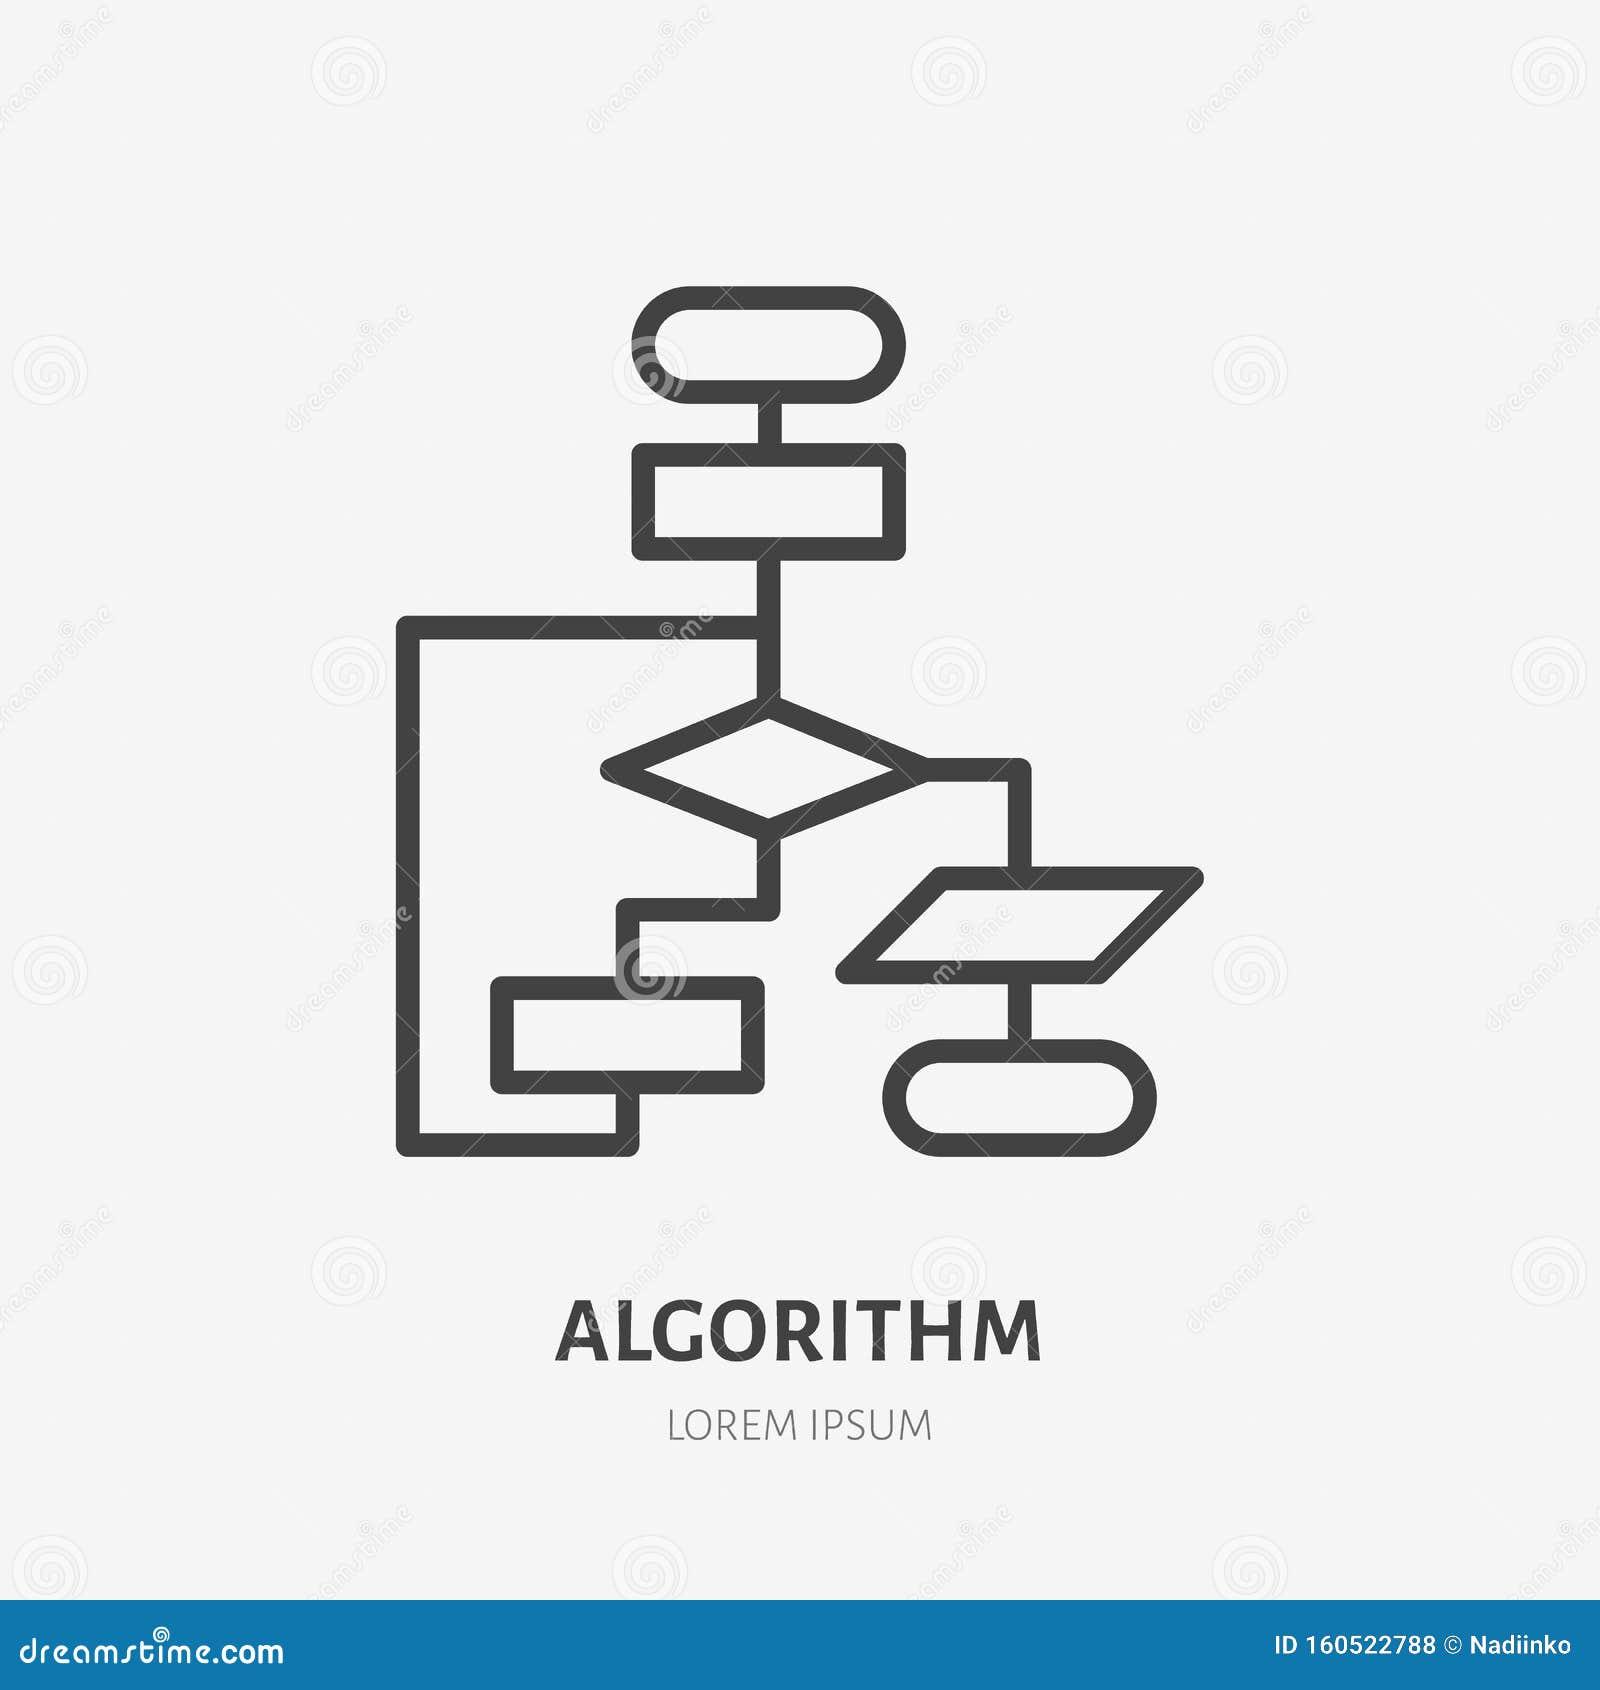 Algorithm flat line icon. Vector thin sign of workflow, diagram logo. Business scheme outline illustration